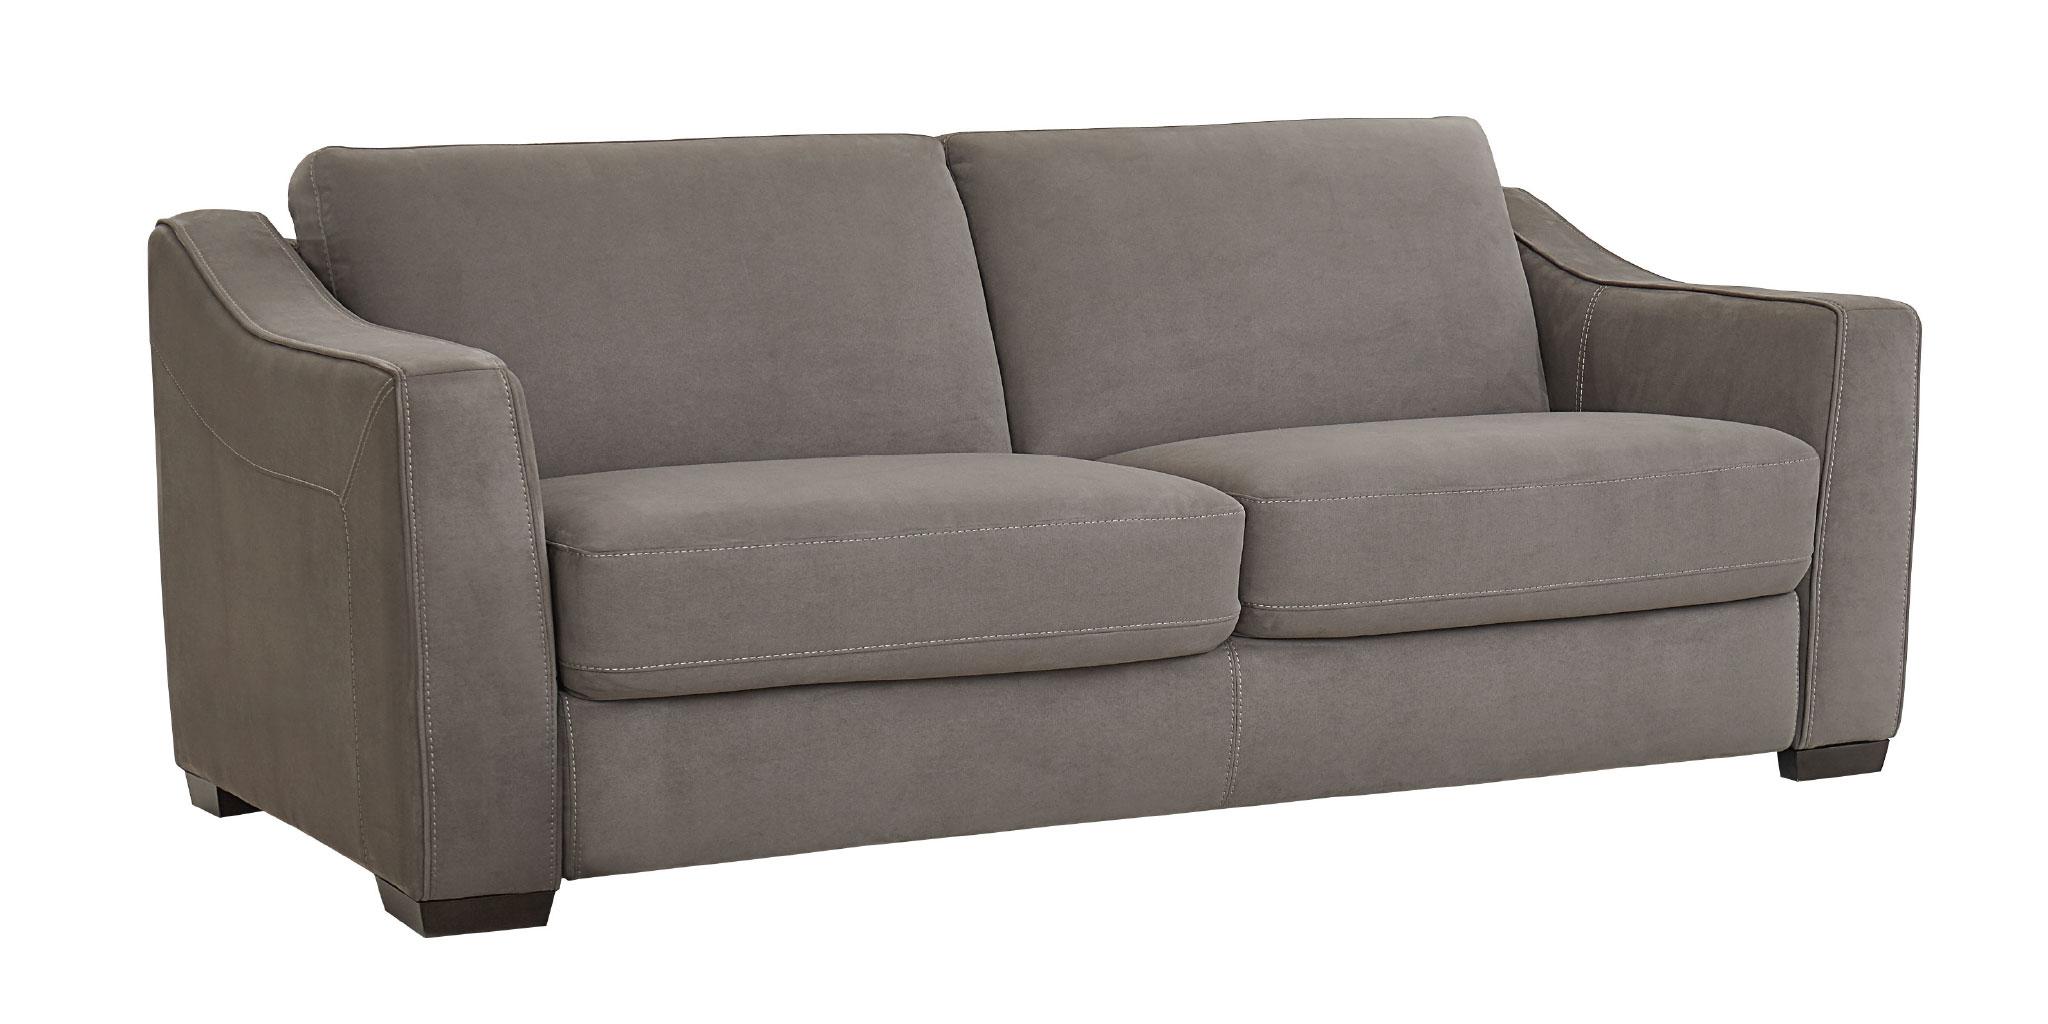 Cordoba Sofa Bed